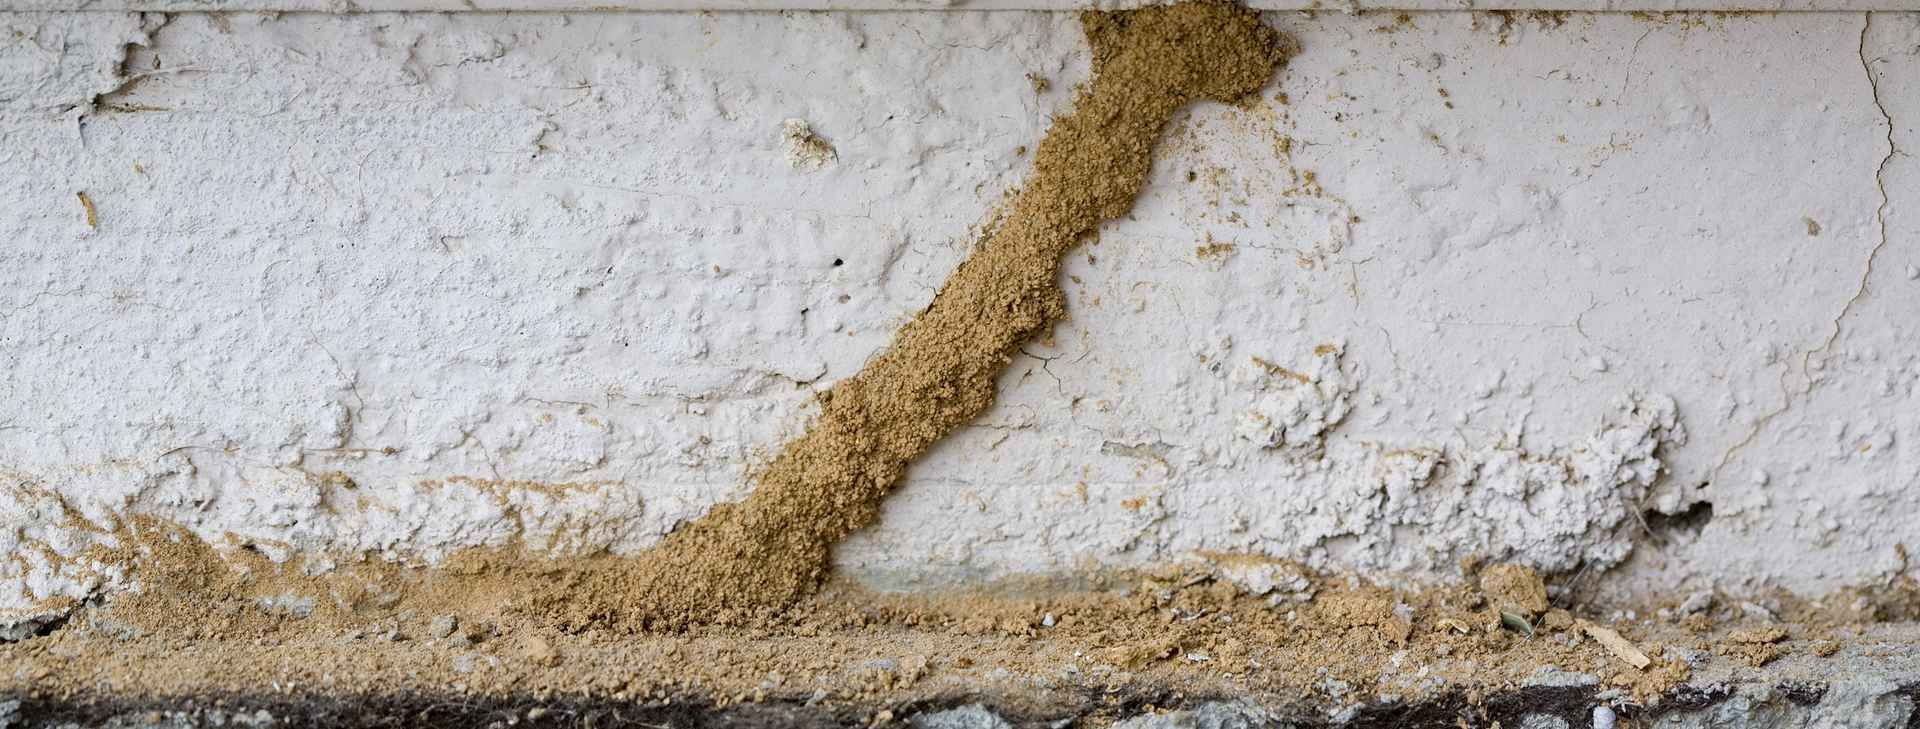 Signs Of Termites White Ants Pest Control Termitrust